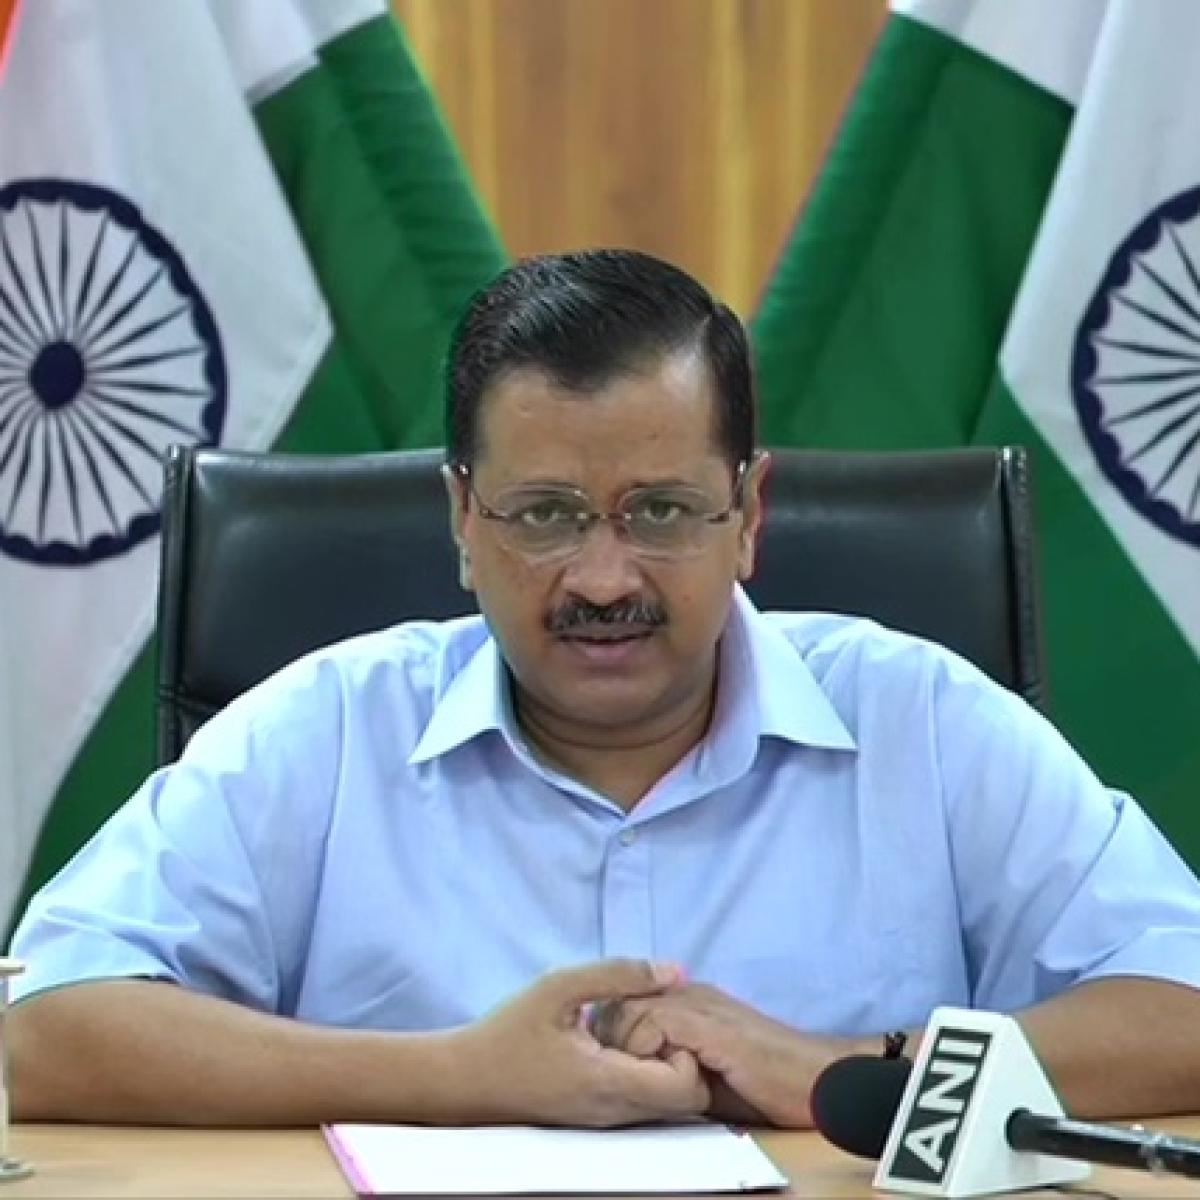 Dilwalon Ki Dilli? Haryana-born Kejriwal says capital hospitals will only treat 'patients from Delhi'